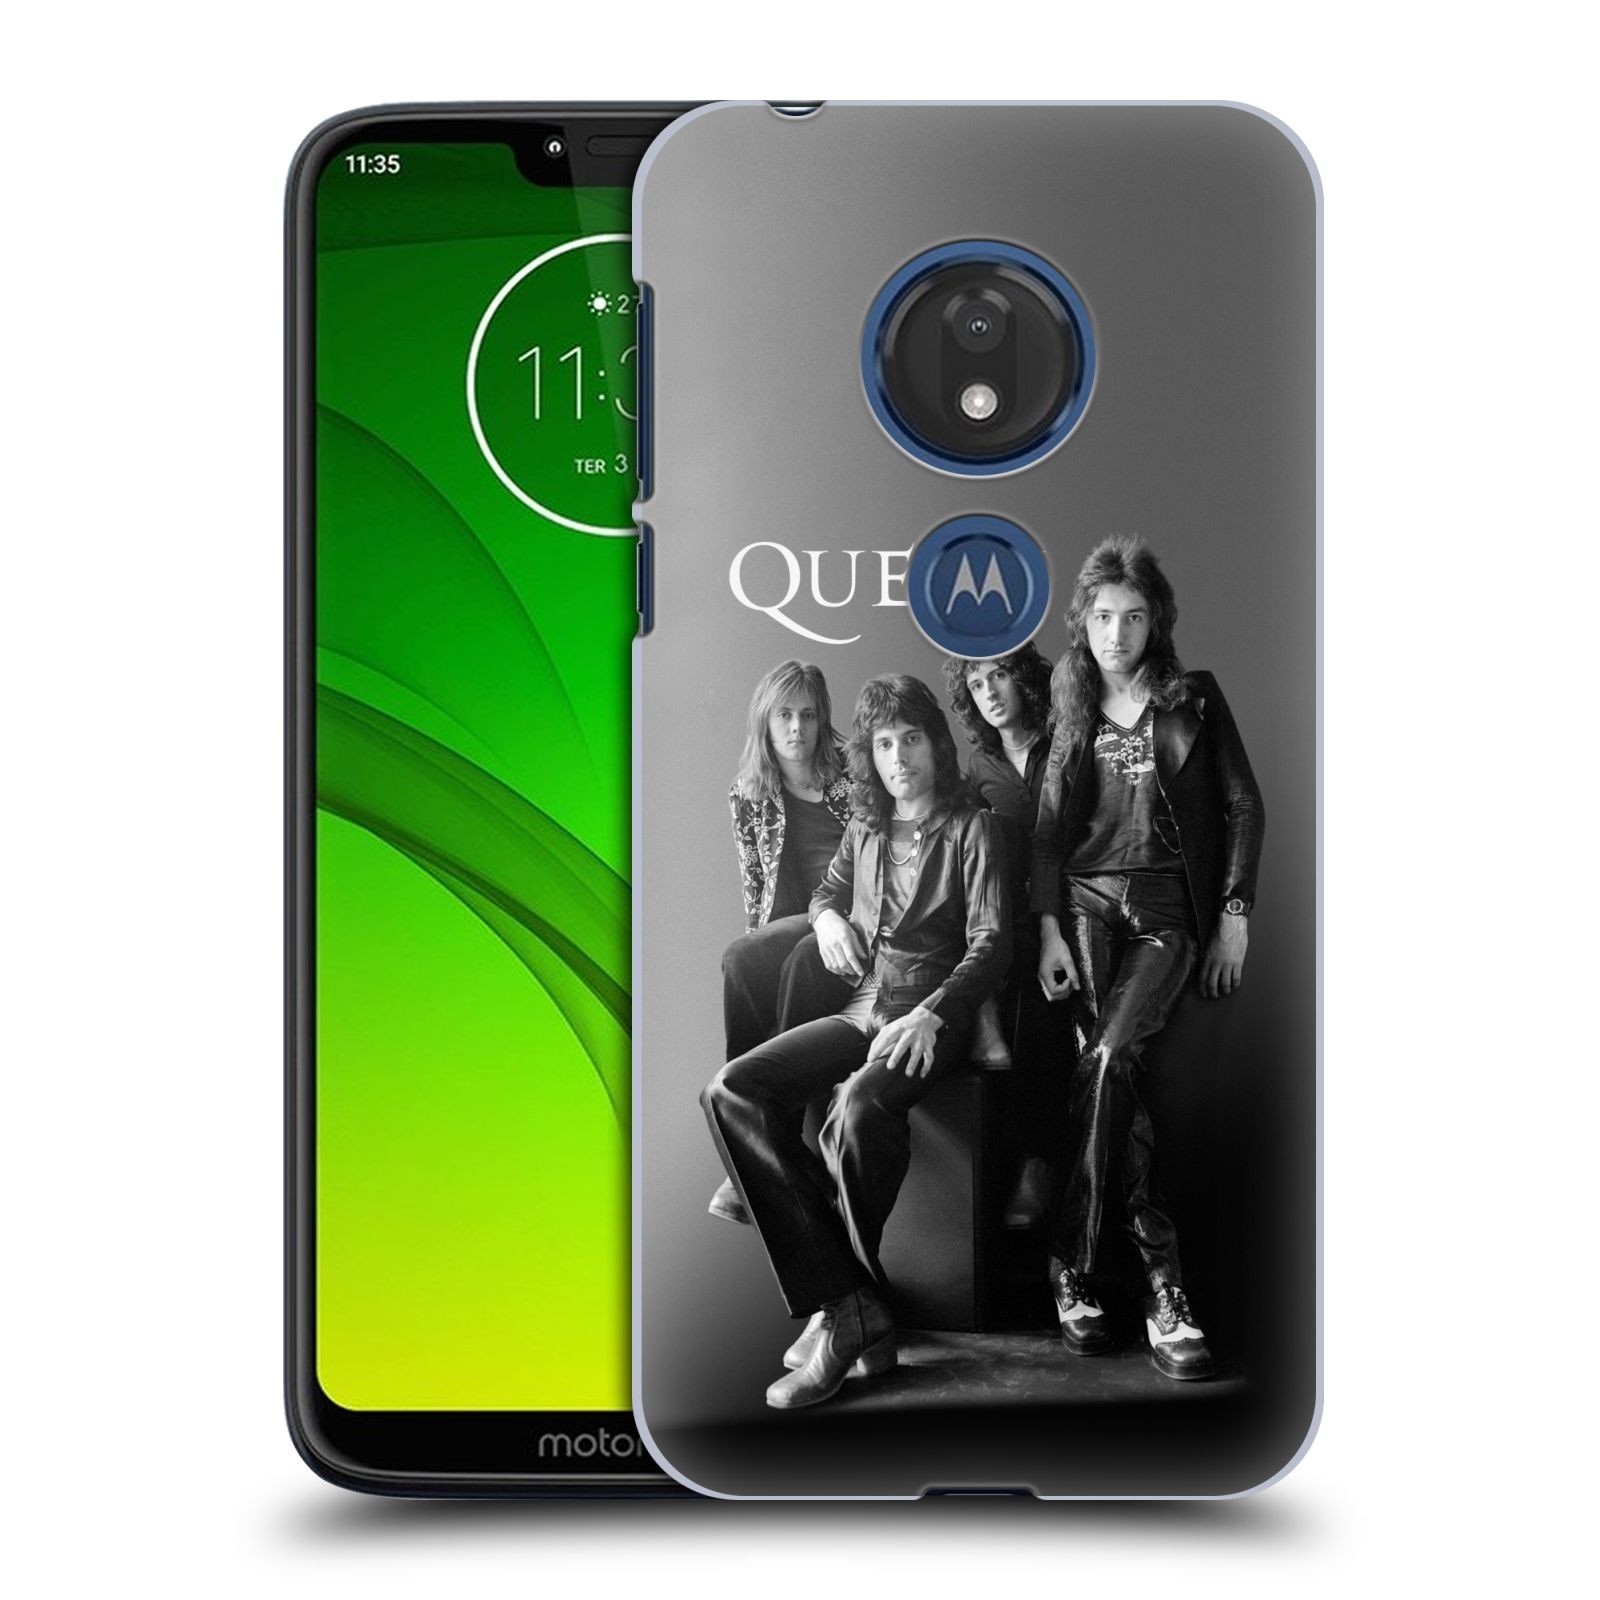 Plastové pouzdro na mobil Motorola Moto G7 Play - Head Case - Queen - Skupina